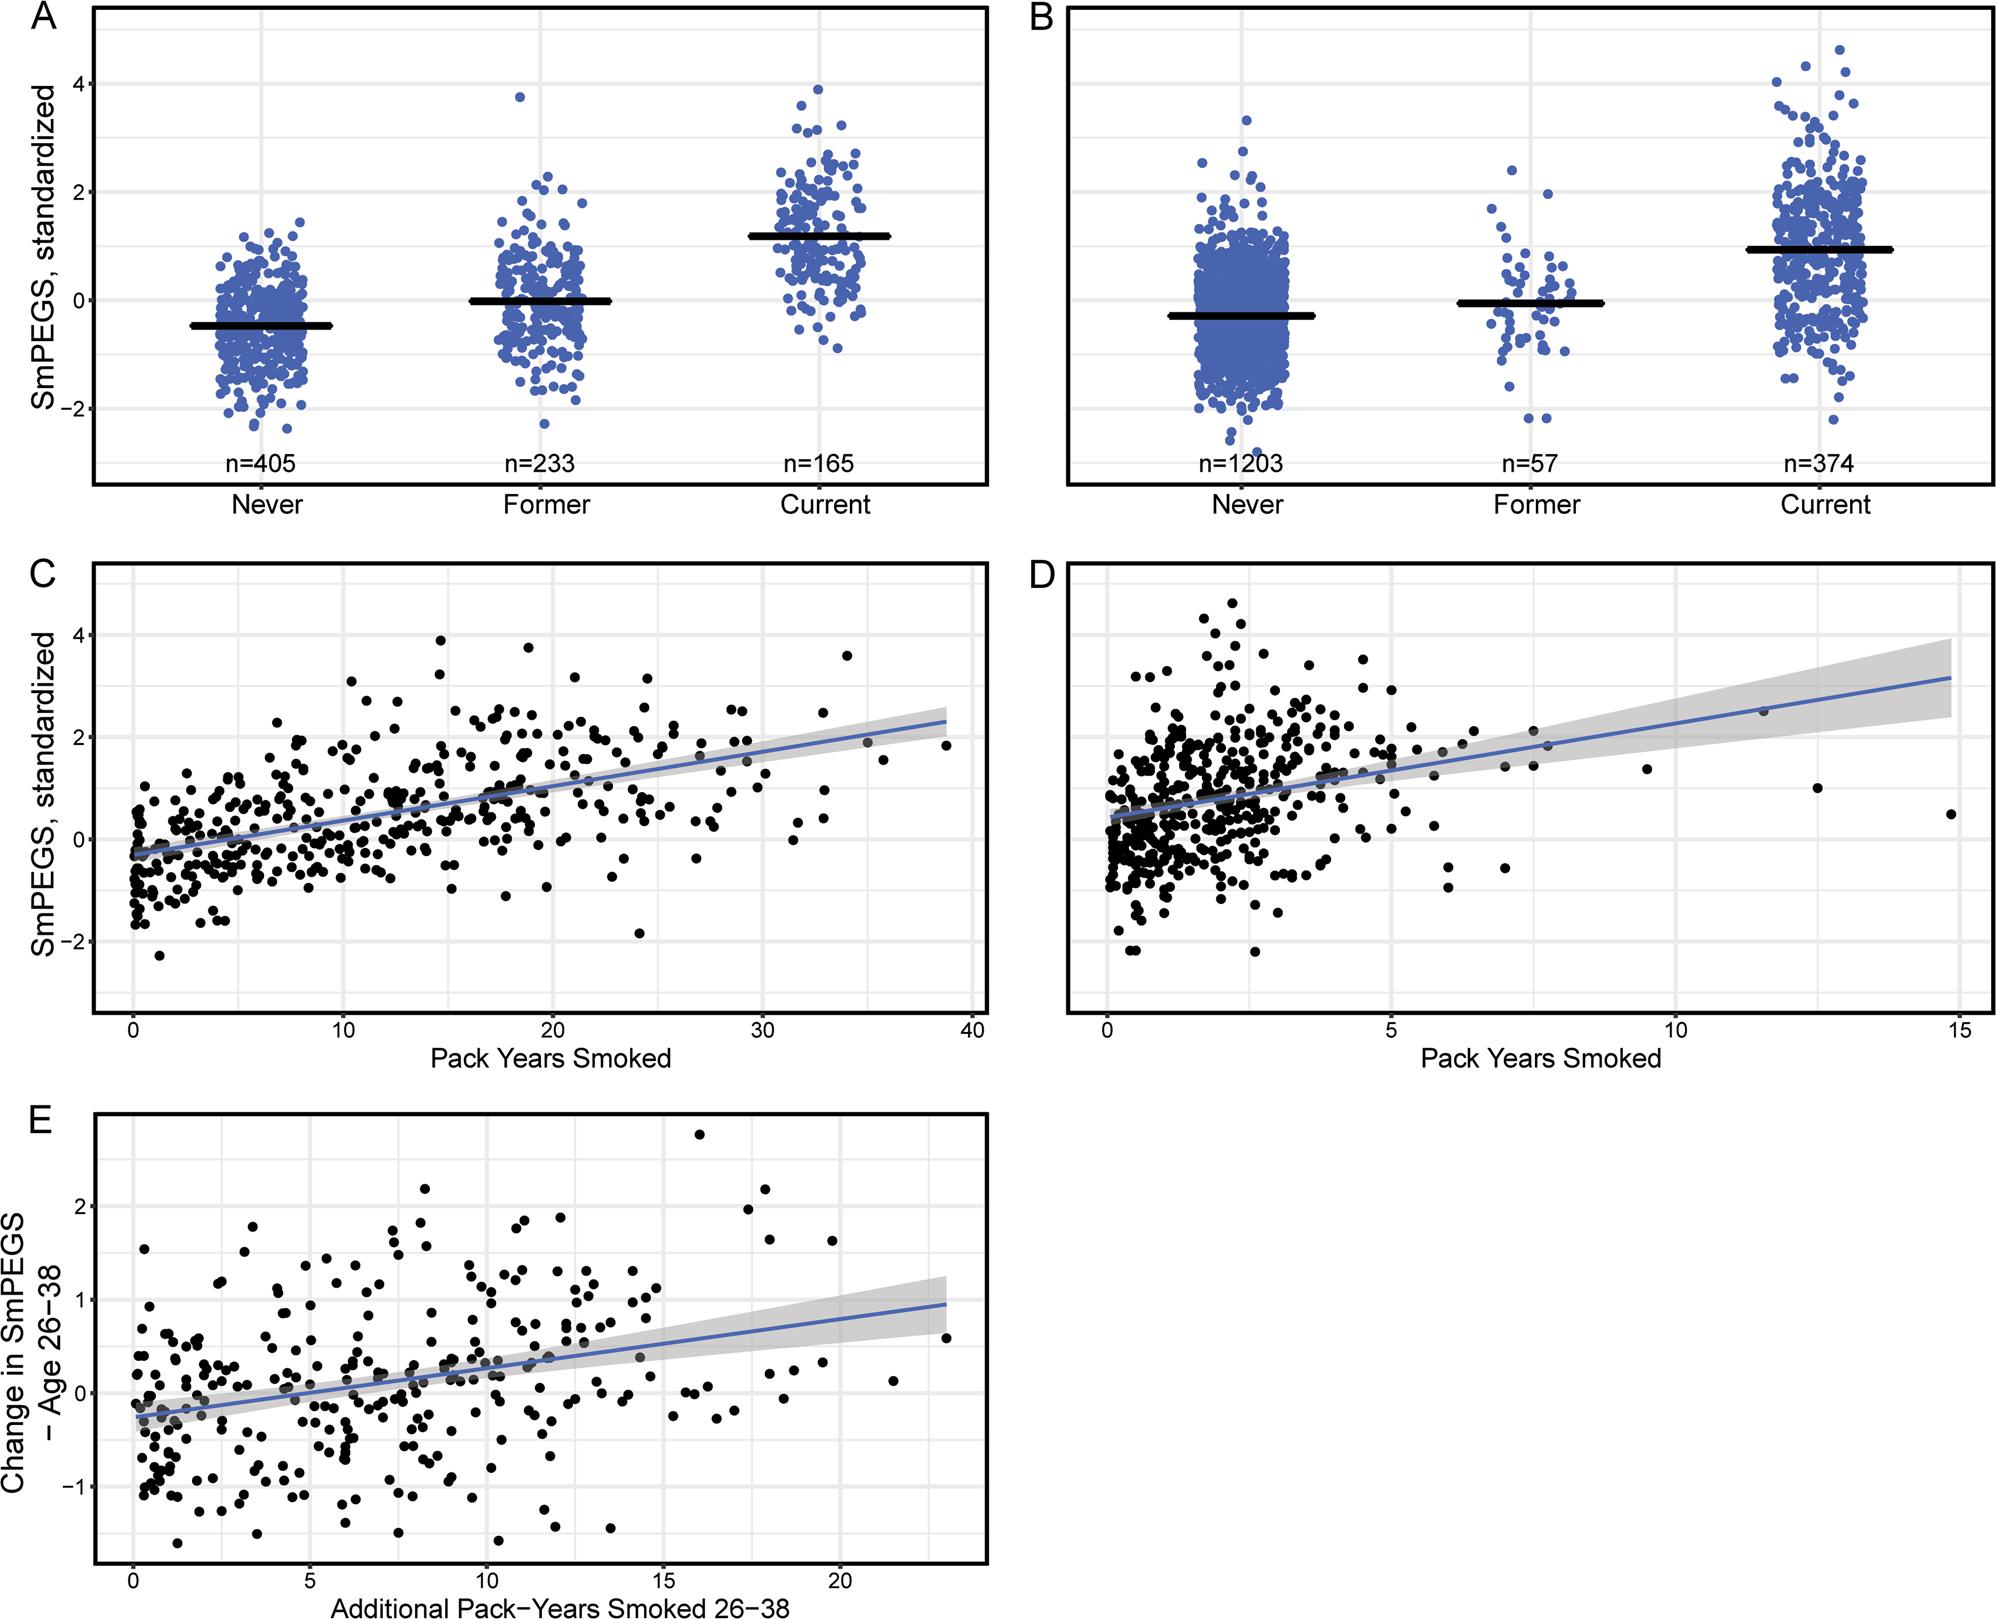 Establishing a generalized polyepigenetic biomarker for